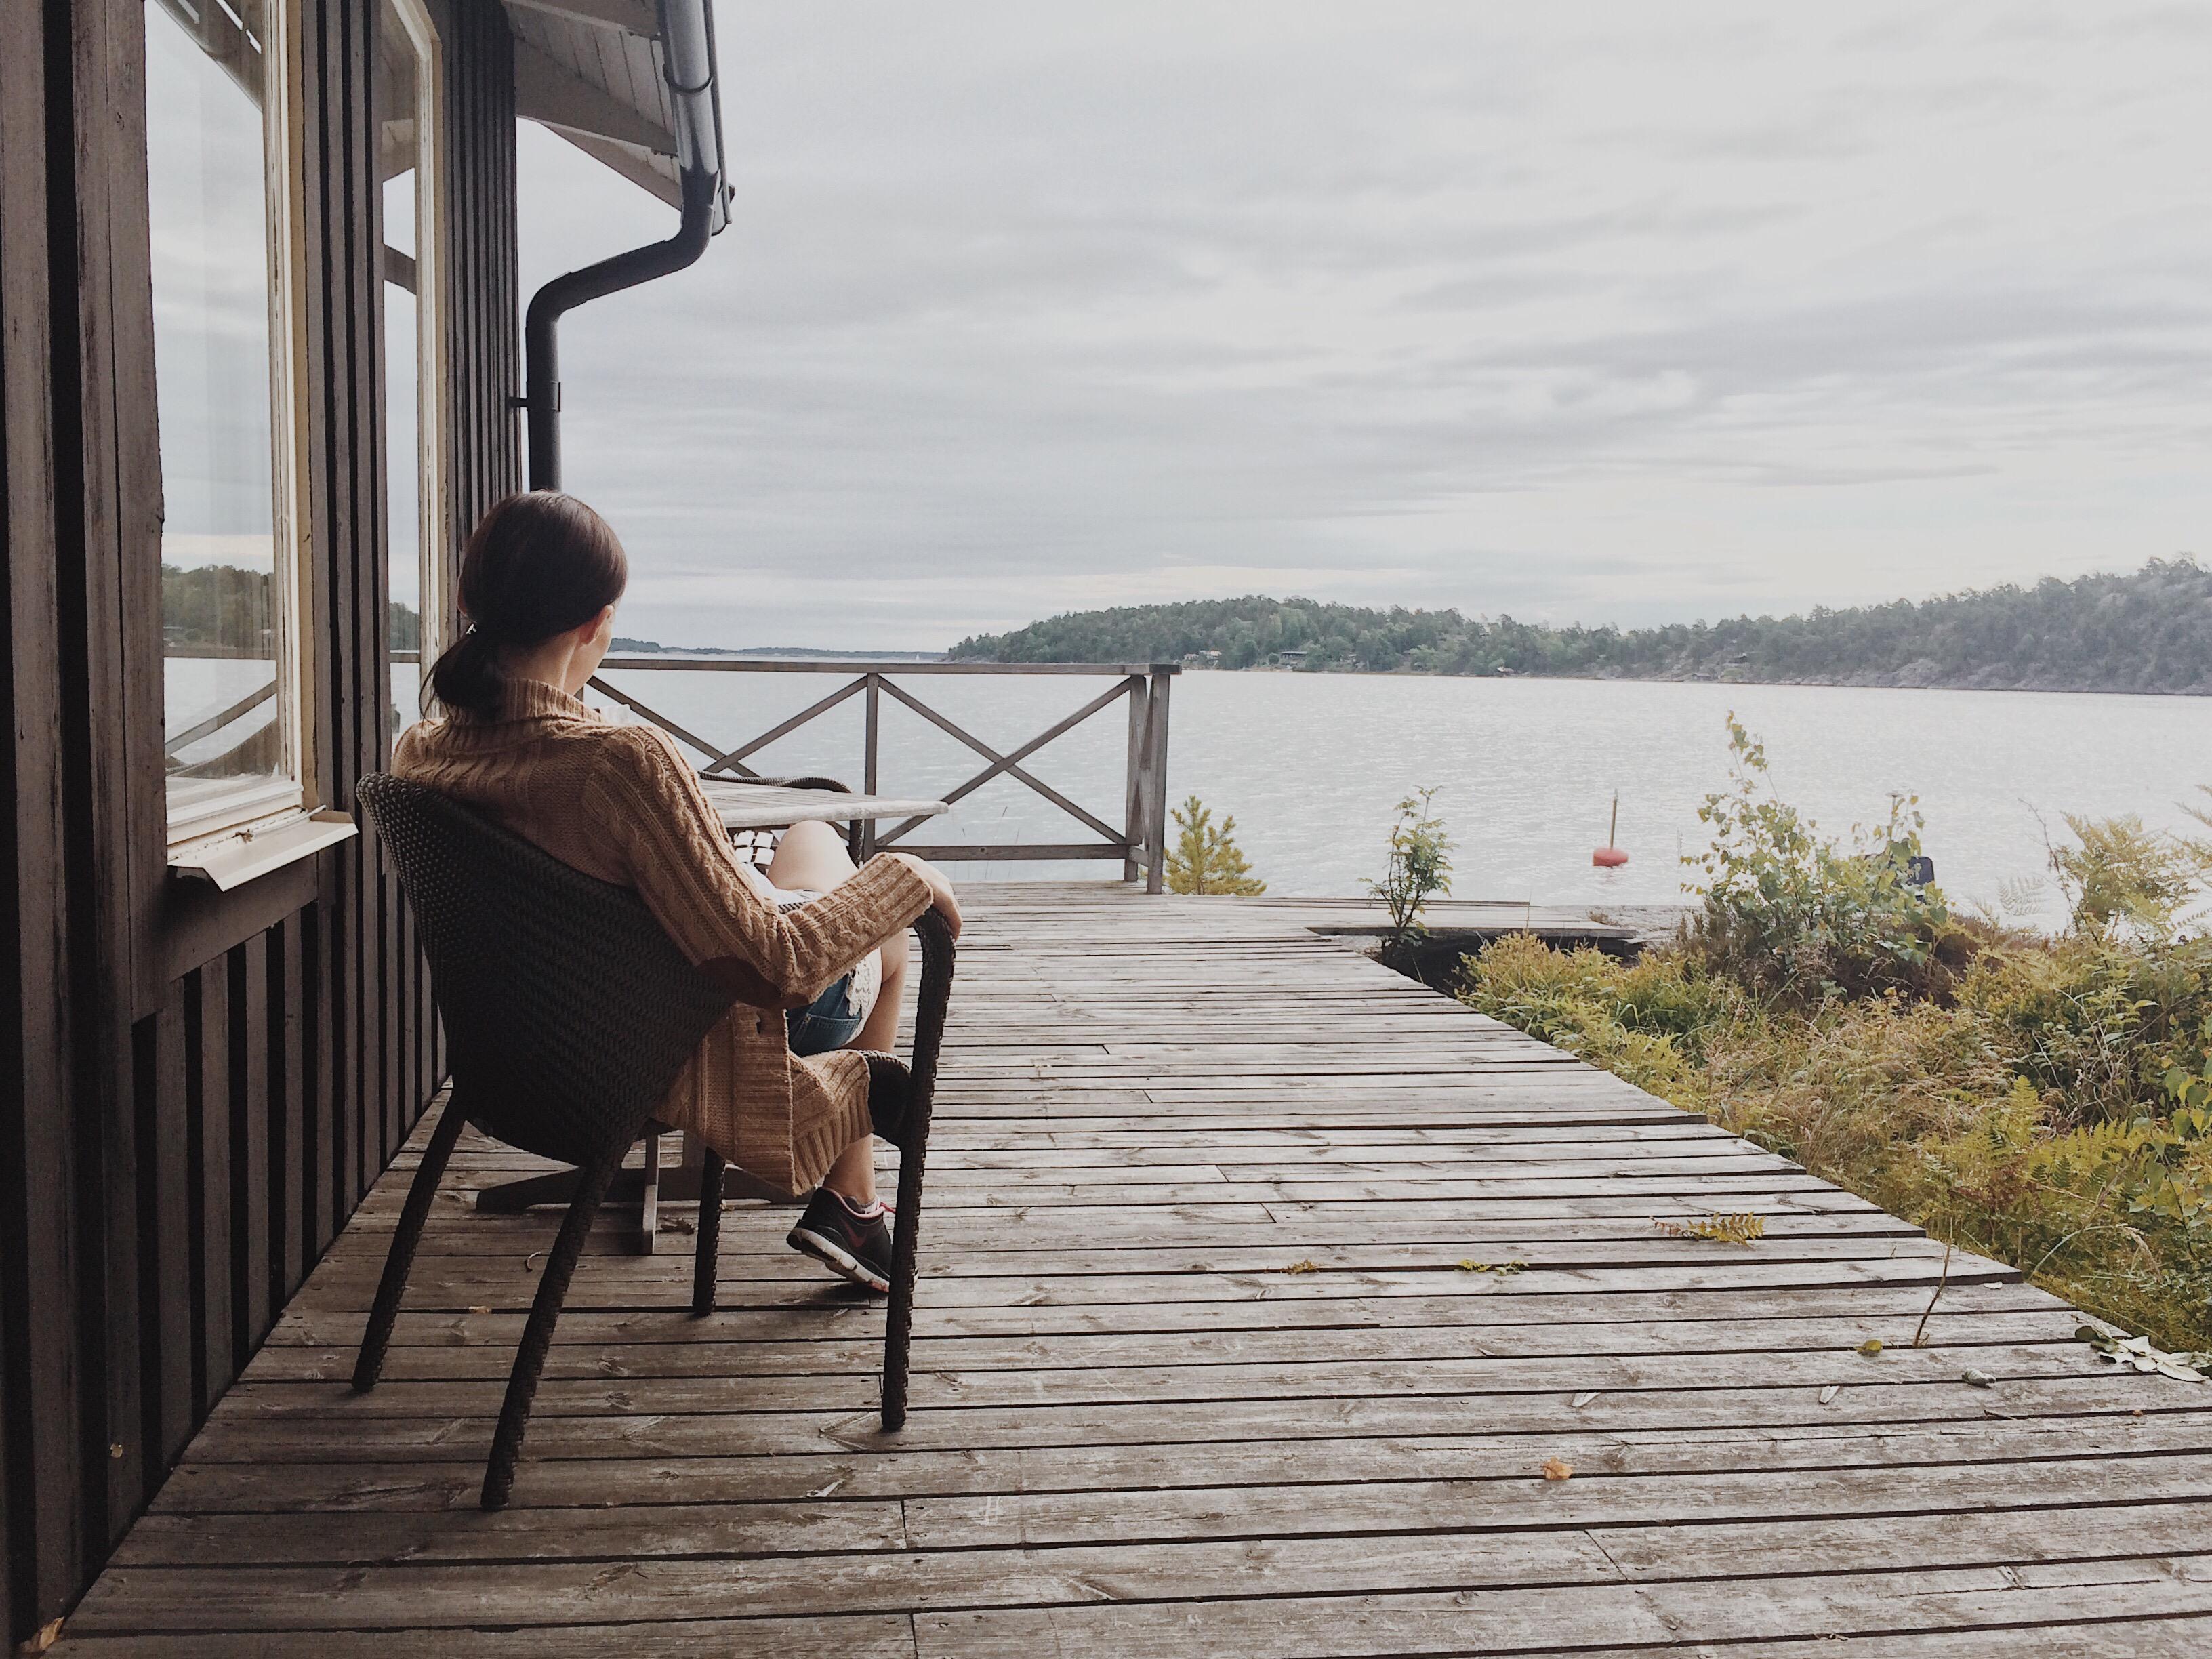 exterior beach cottages cabins ontario wasaga maximum cottage rentals com capacity and riverbend index